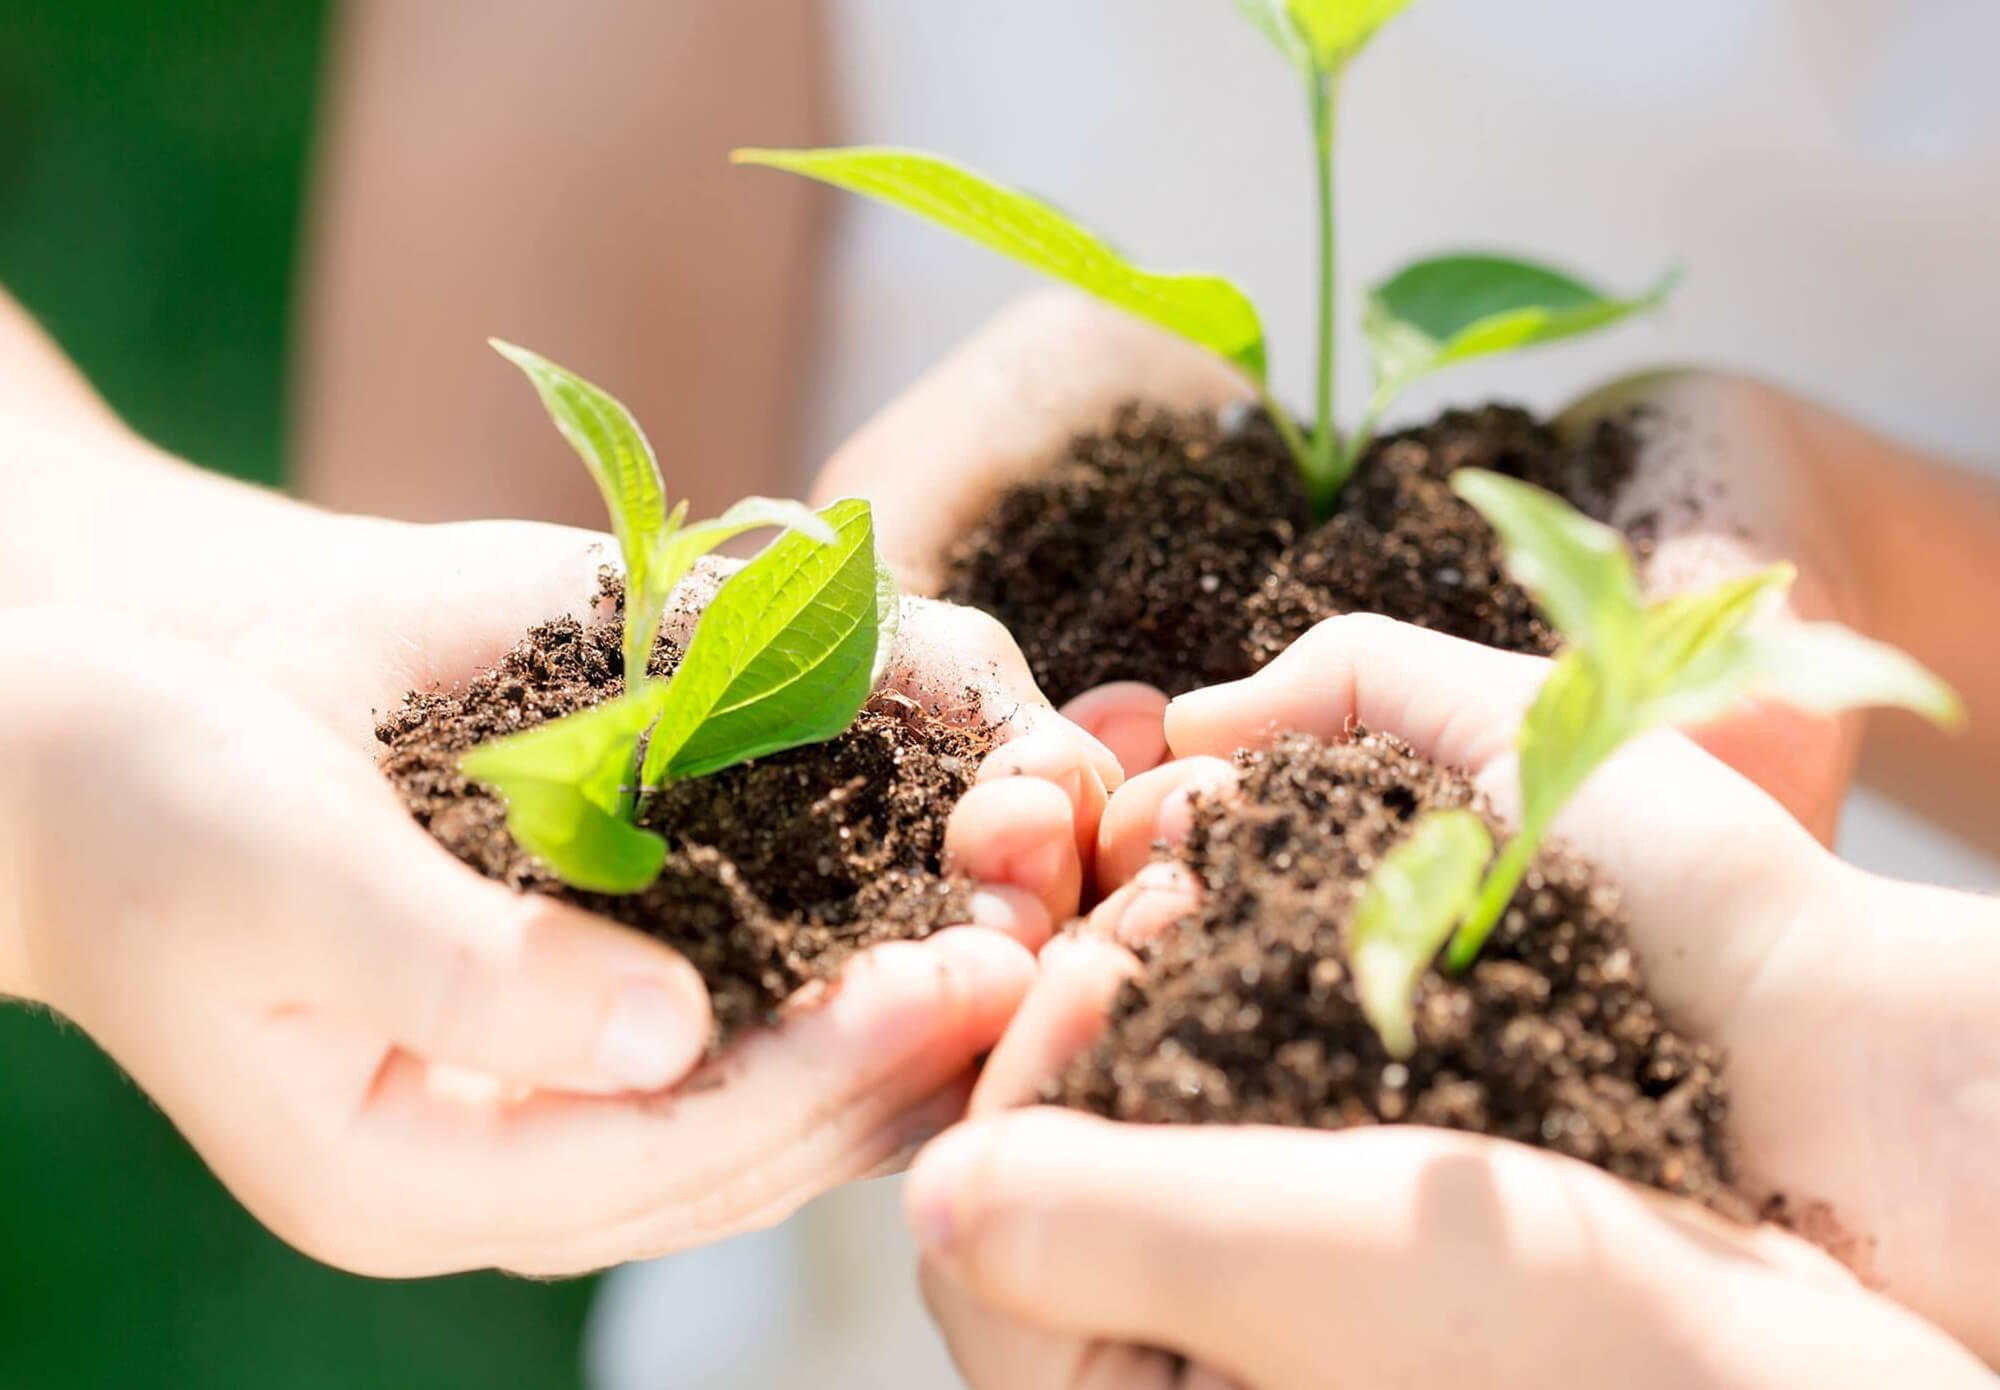 trenner-nachhaltigkeit-haende-saetzlinge-zukunft